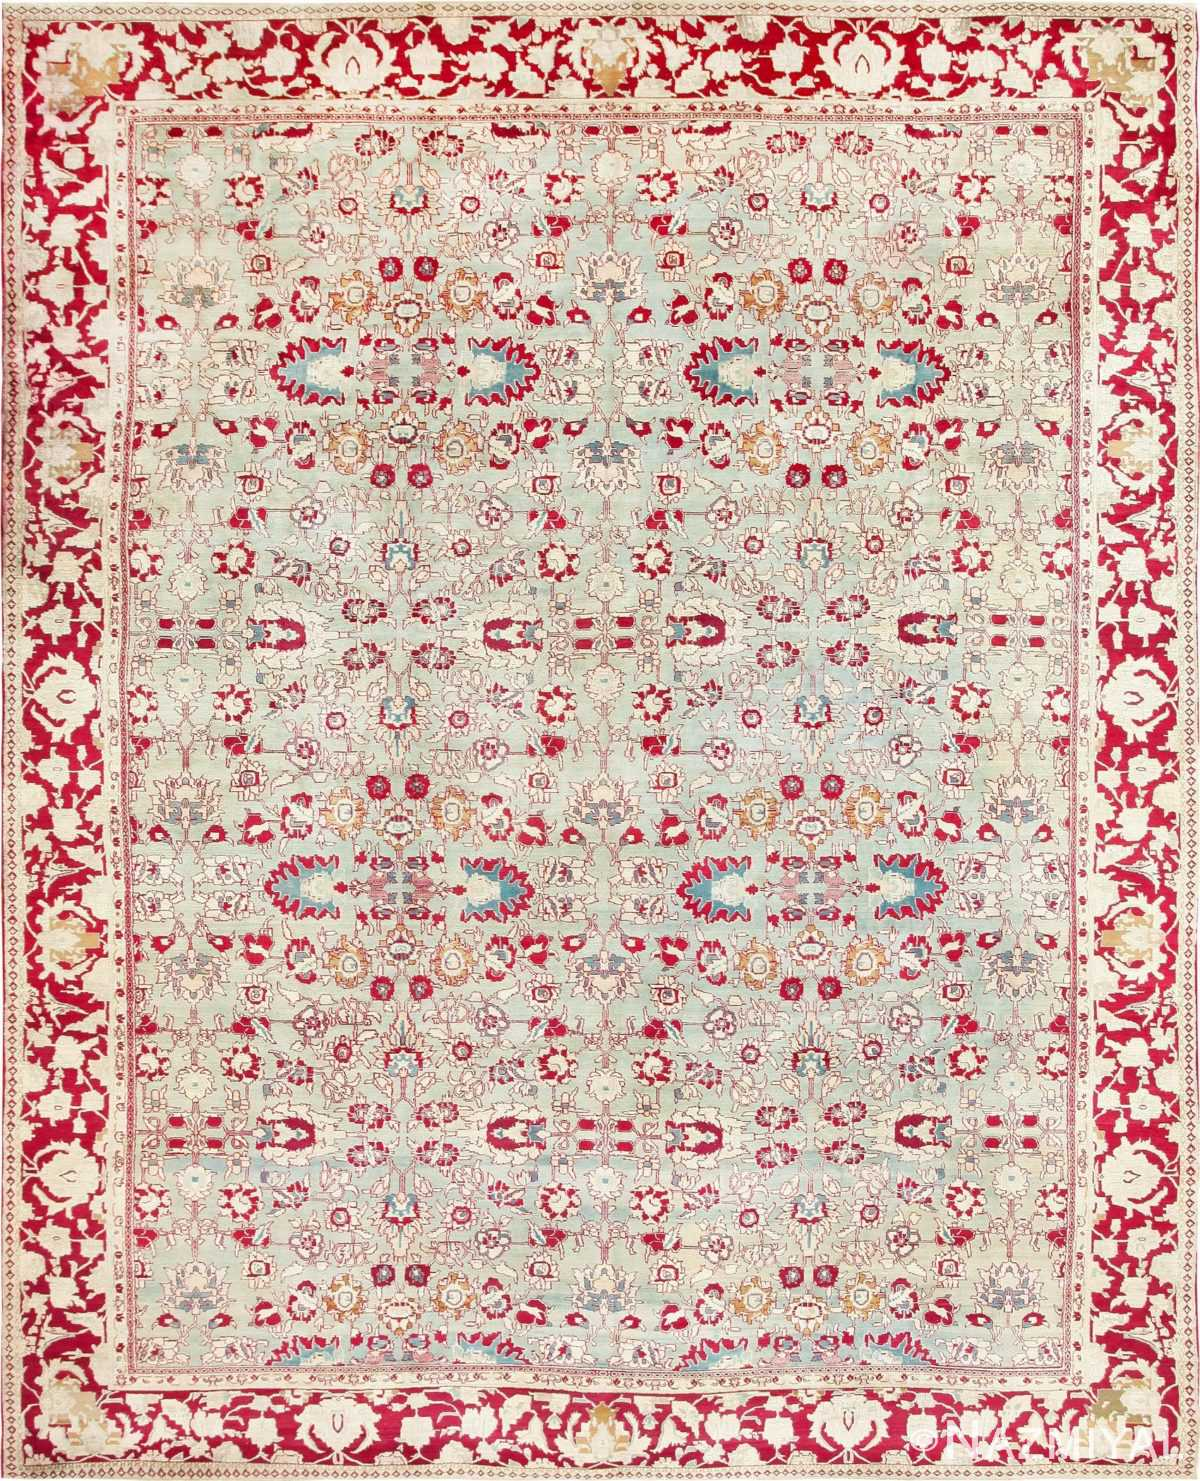 Antique Indian Agra Carpet 47369 Large Image